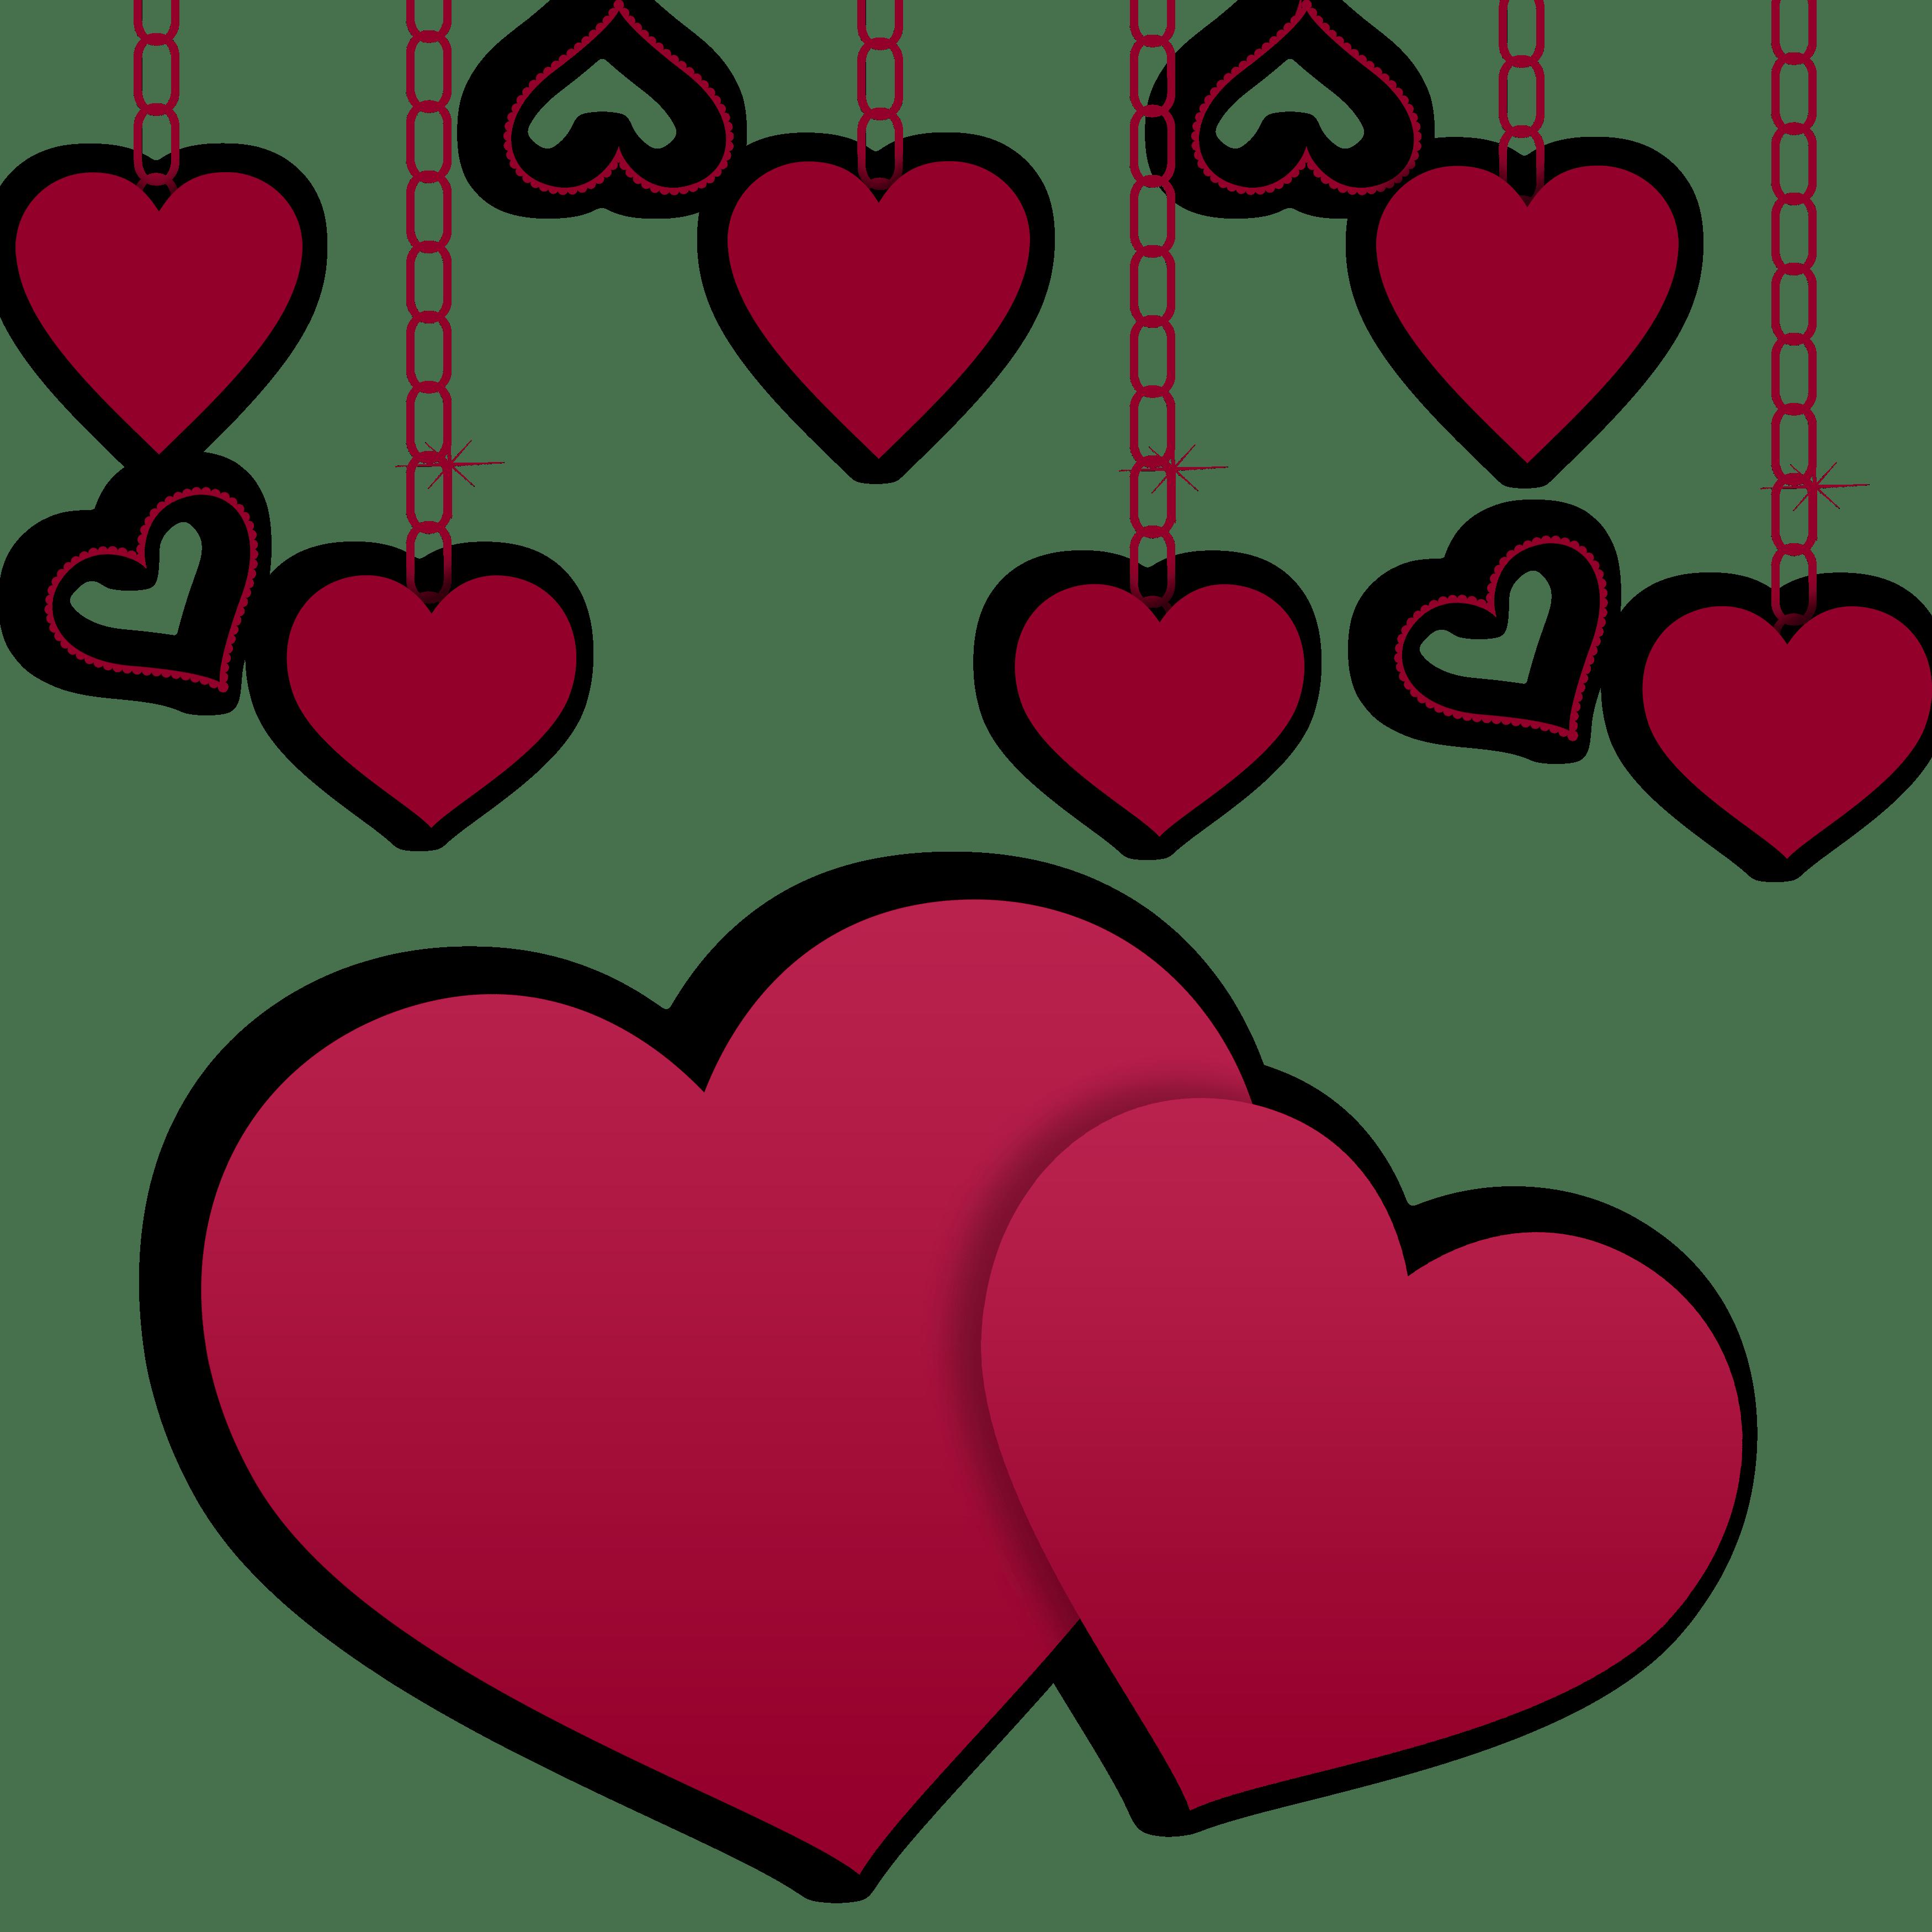 Heat clipart funky heart. Hearts illustration valentine day